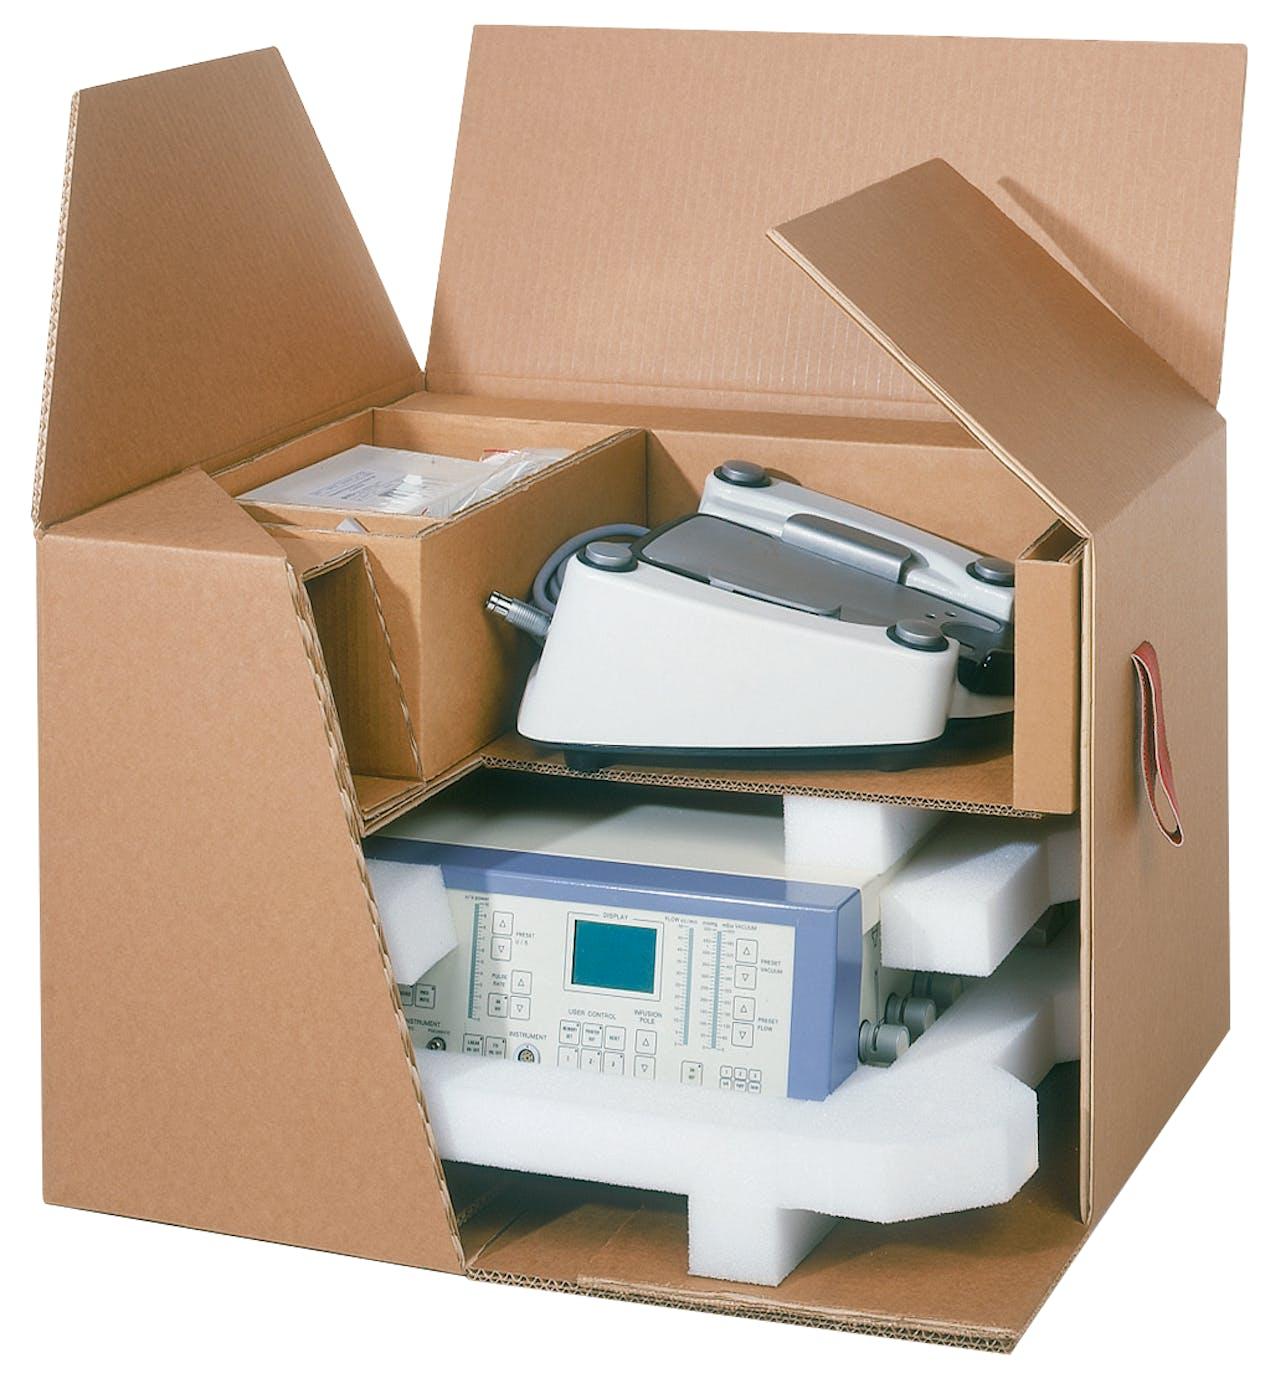 Formteile, individuelle Verpackung im Karton